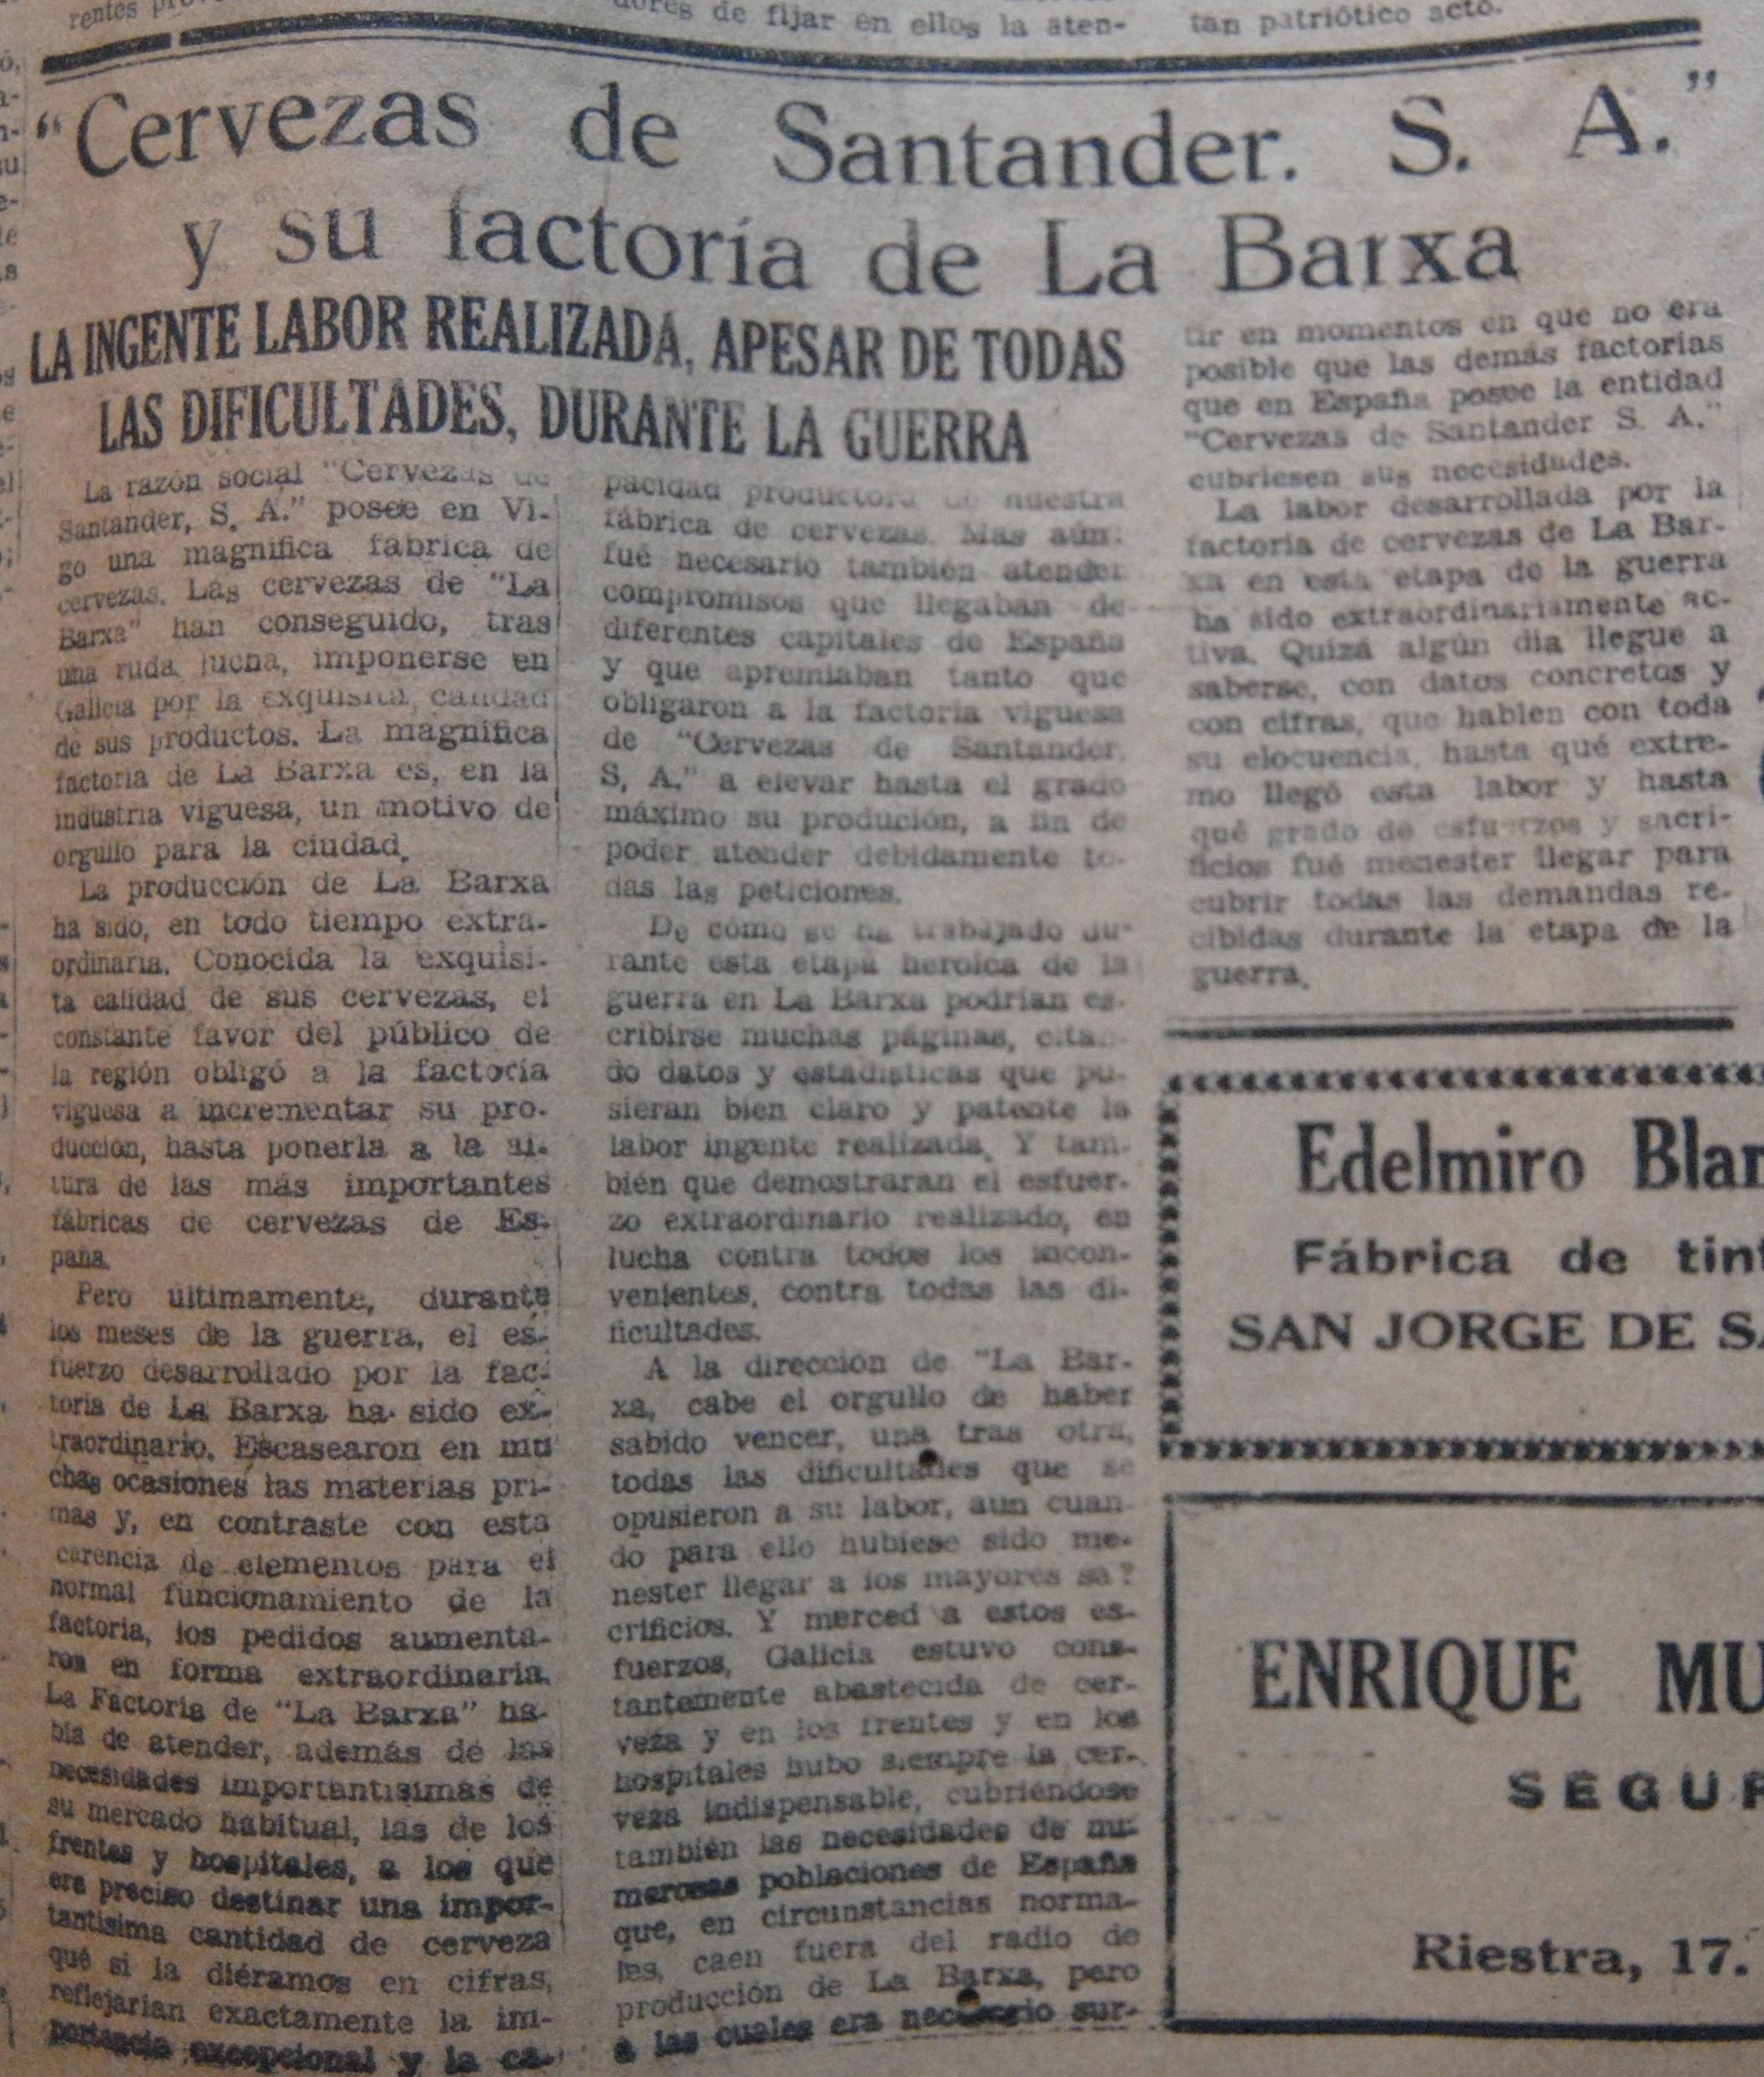 Cervezas de Santander- A Barxa